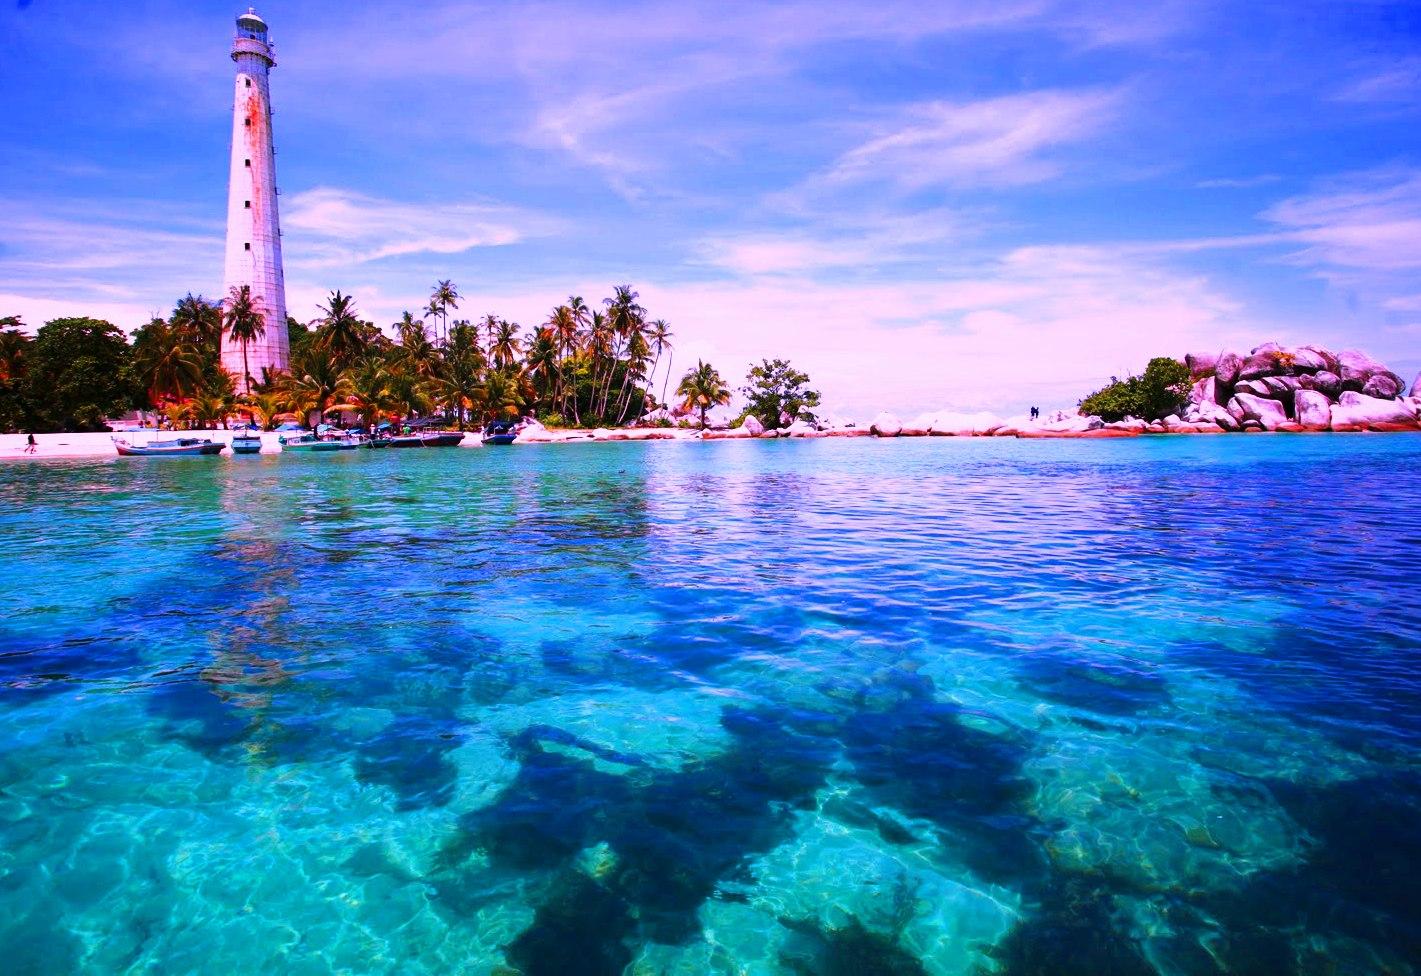 Belitung Indonesia  city photos gallery : belitung pulau lengkuas belitung